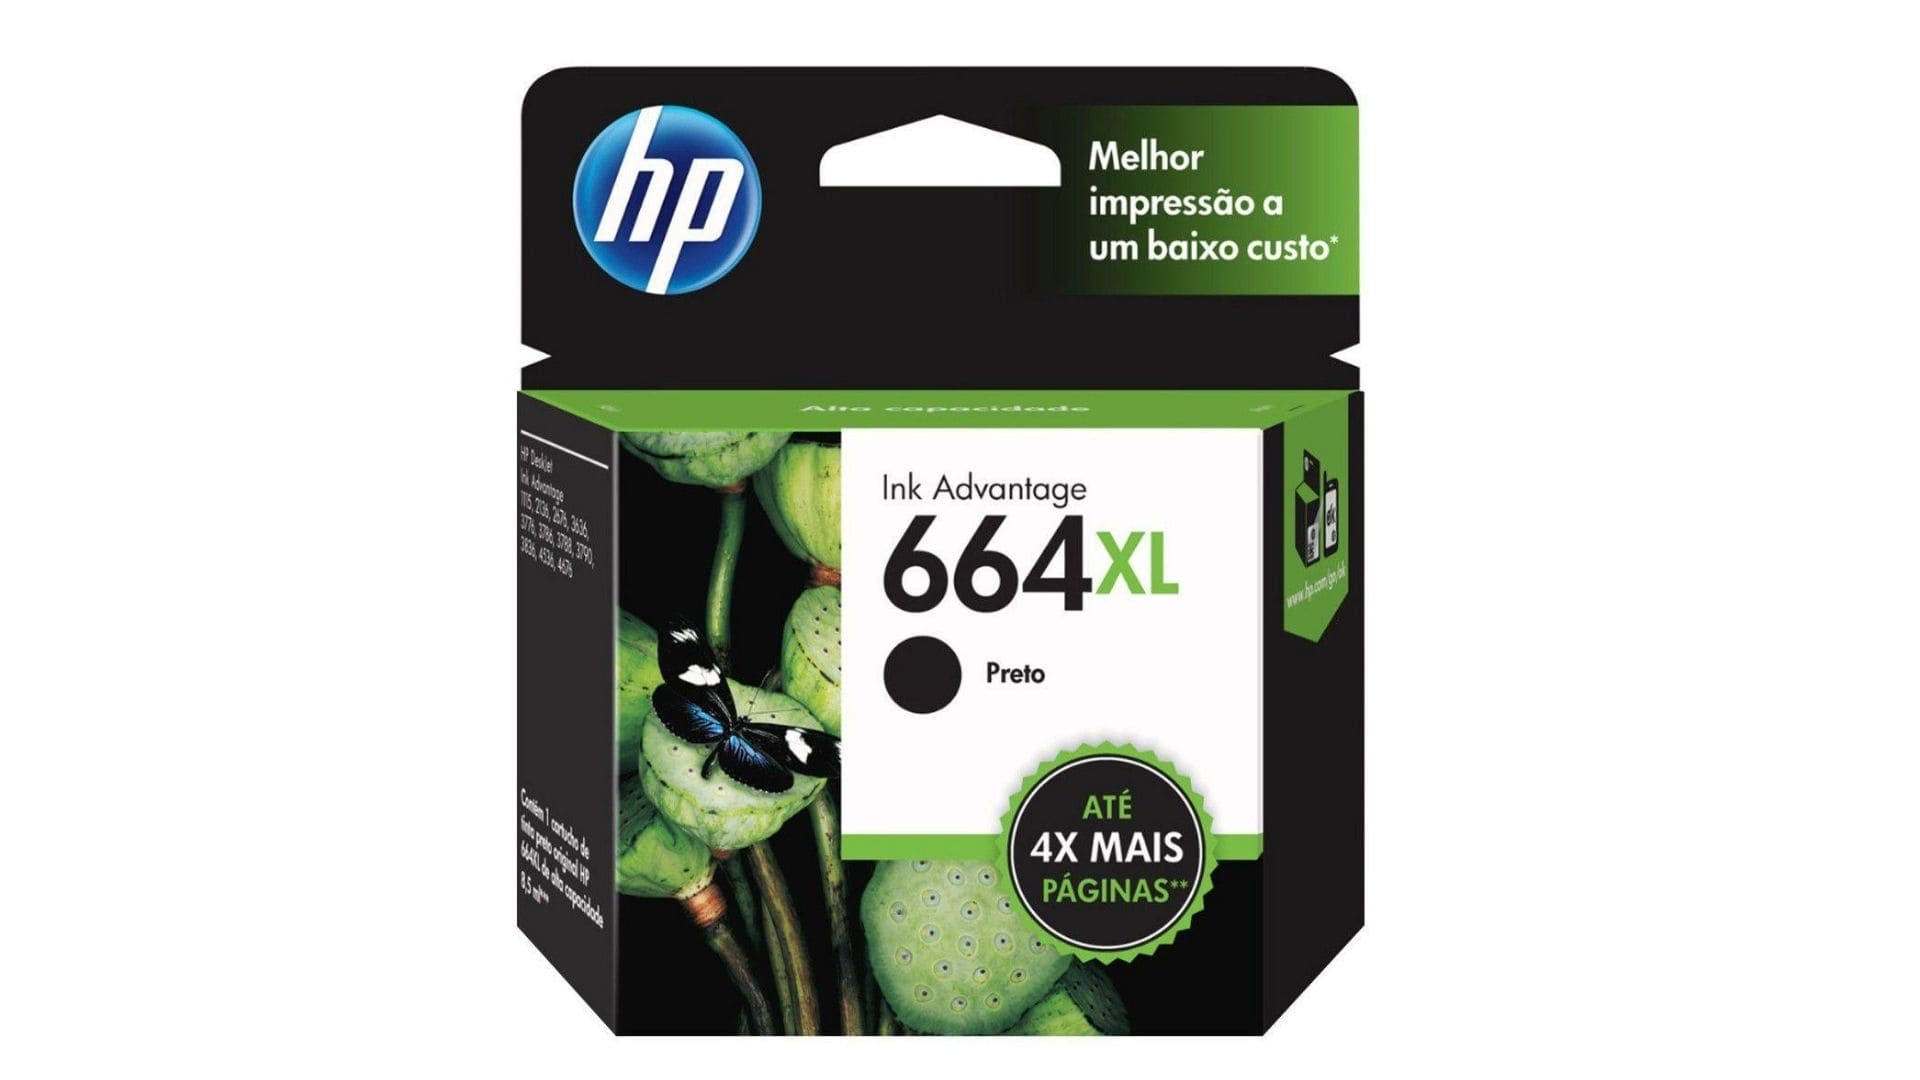 Cartucho de Tinta para impressora HP Preto 664 XL